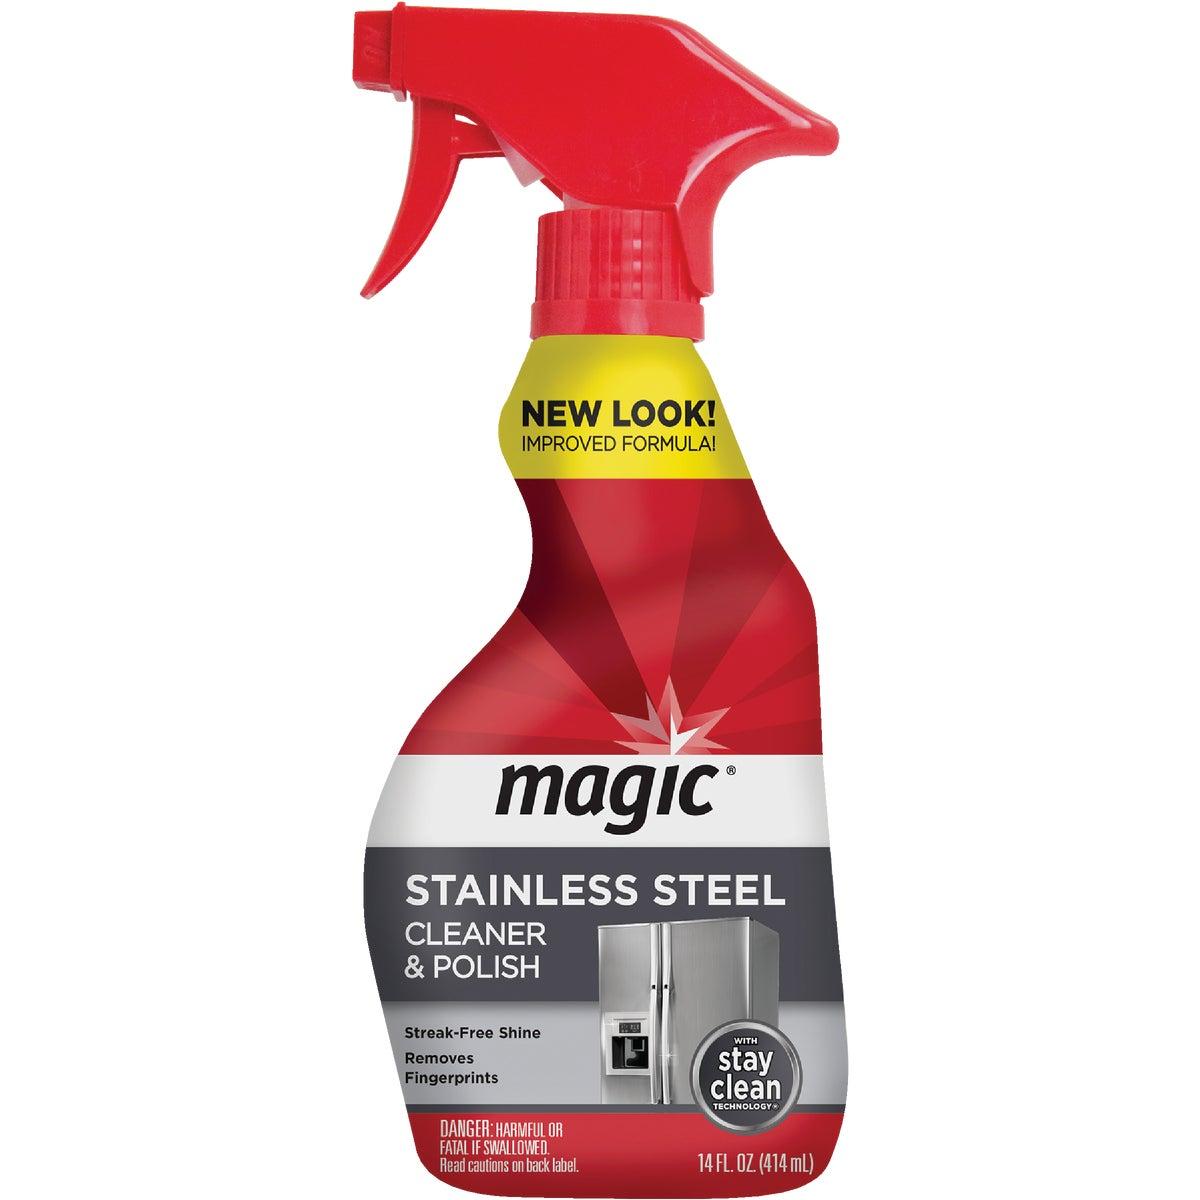 14OZ STNLS STEEL CLEANER